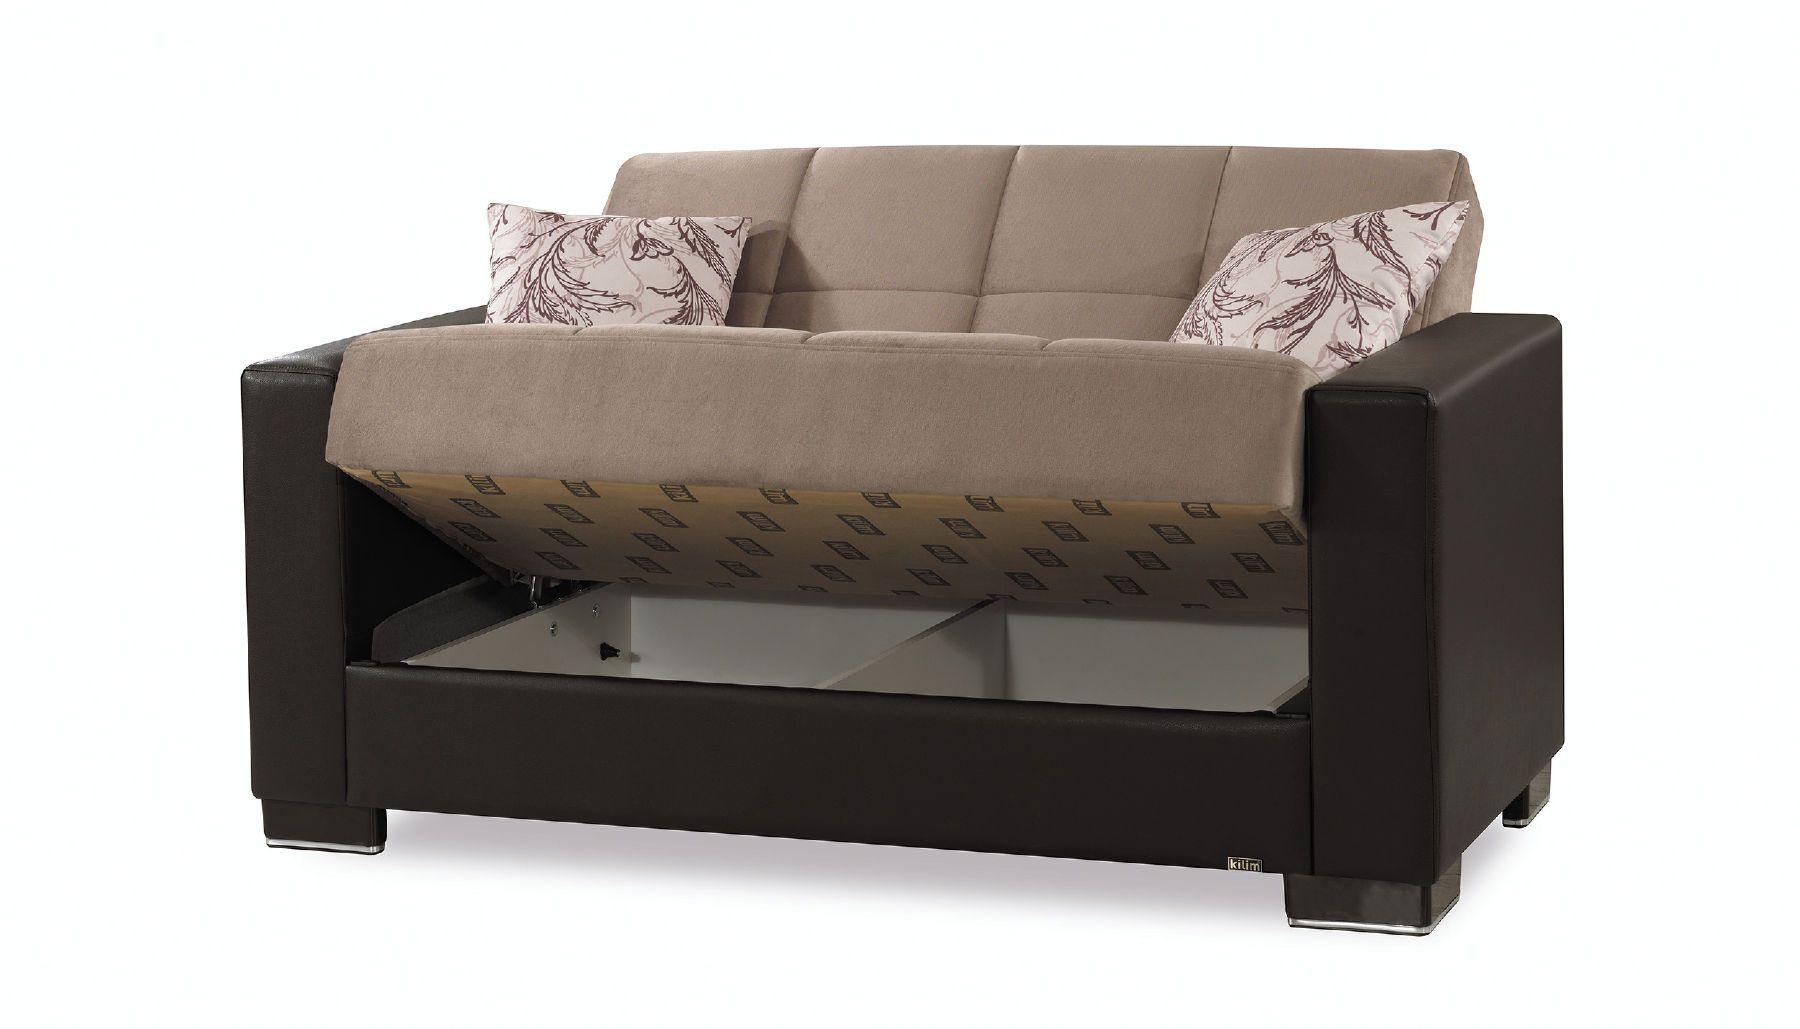 Armada Sand Brown Sofa In 2020